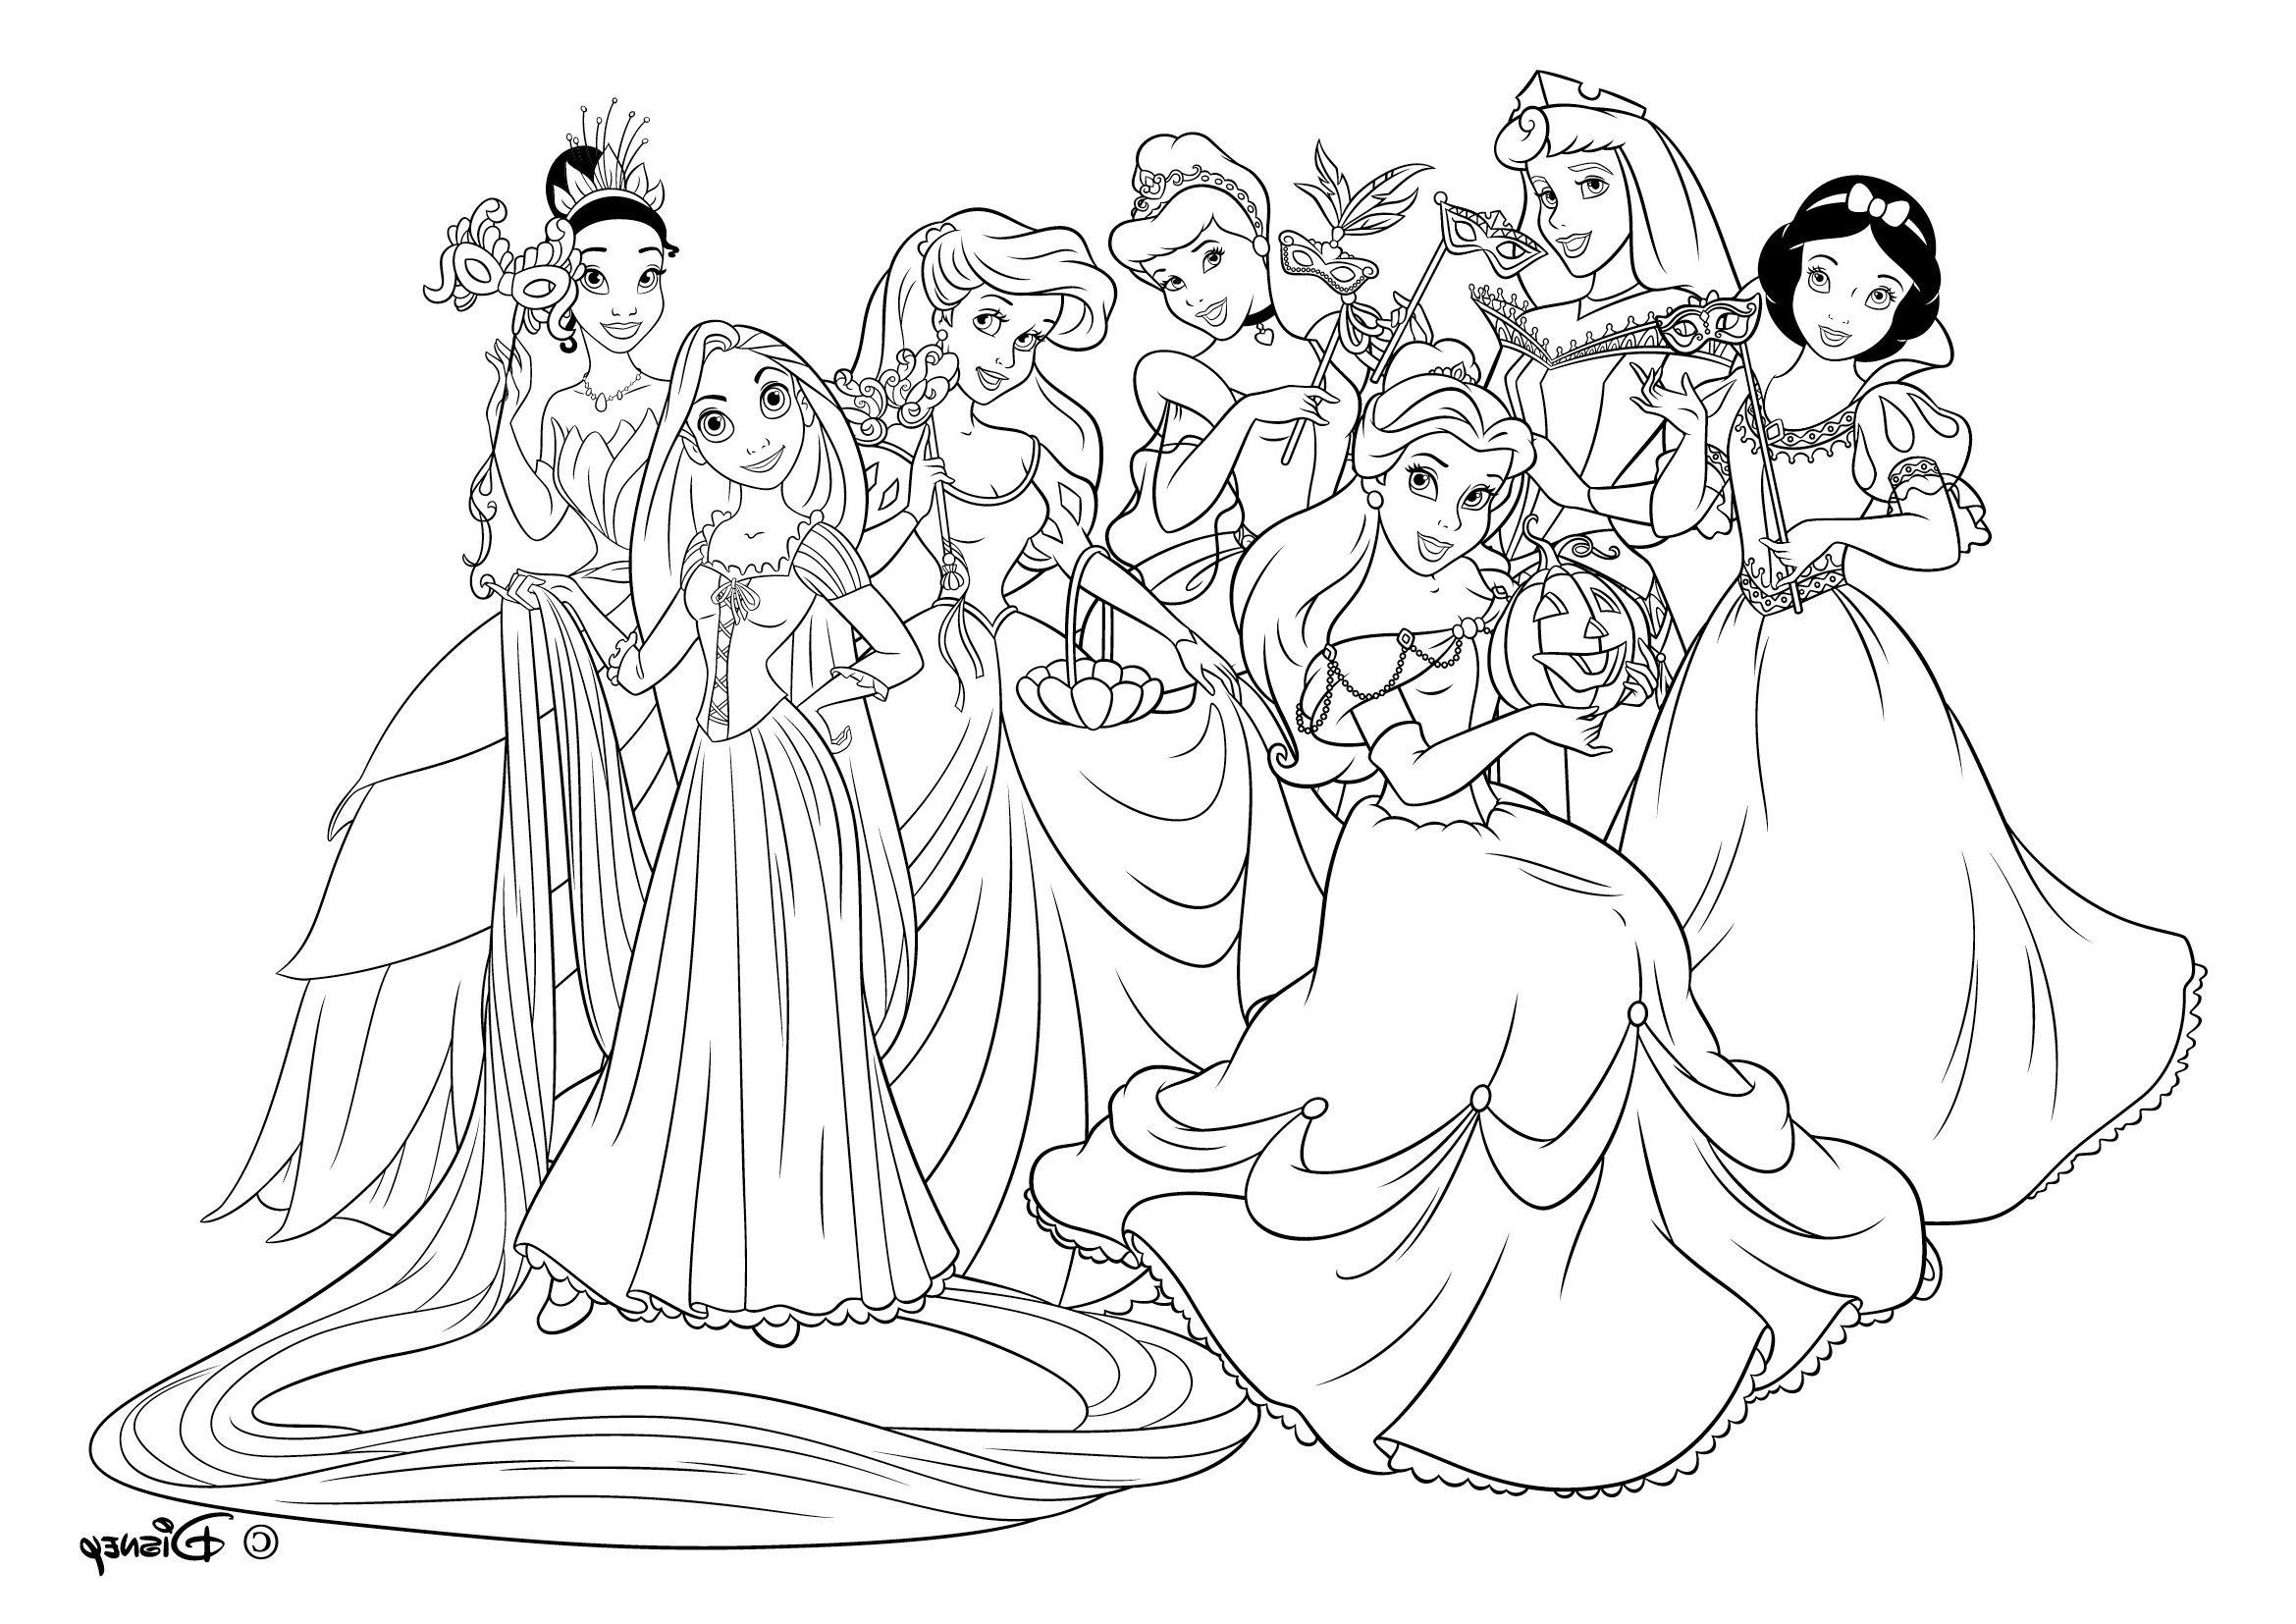 19 Parfait Coloriage Princesse Disney Stock Check more at https